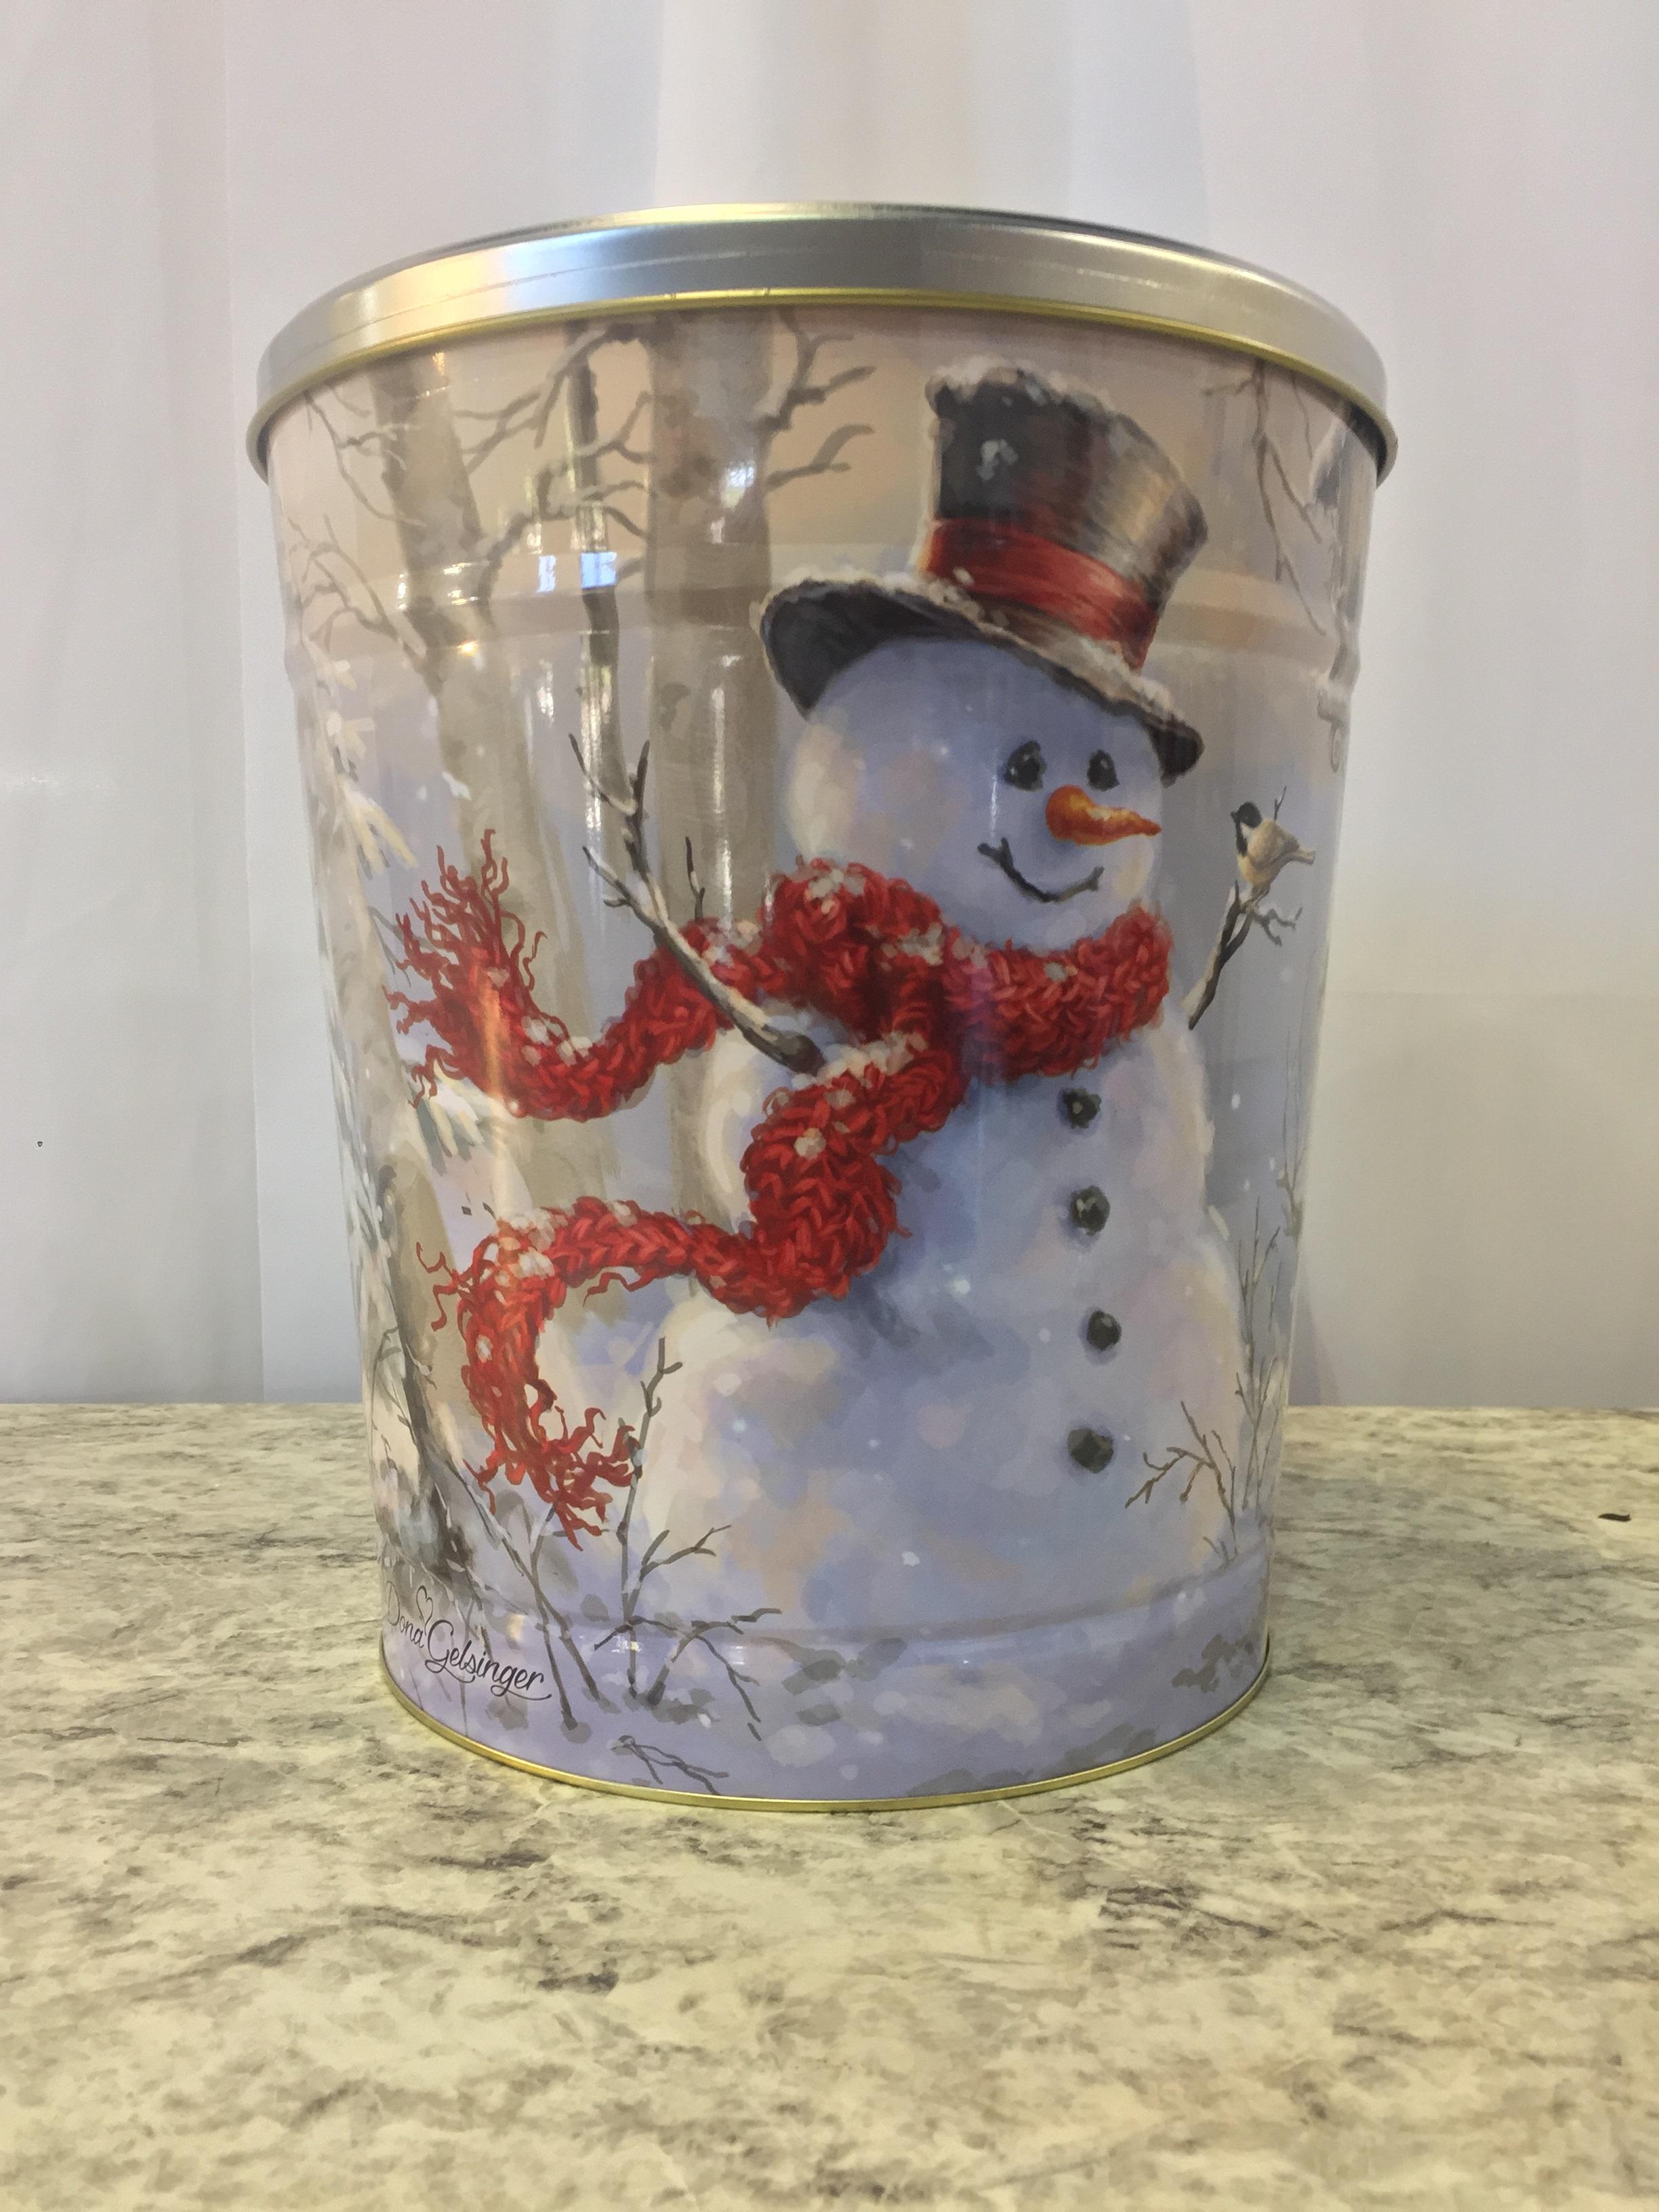 3.5 Gal Winter Snoman Popcorn Tin